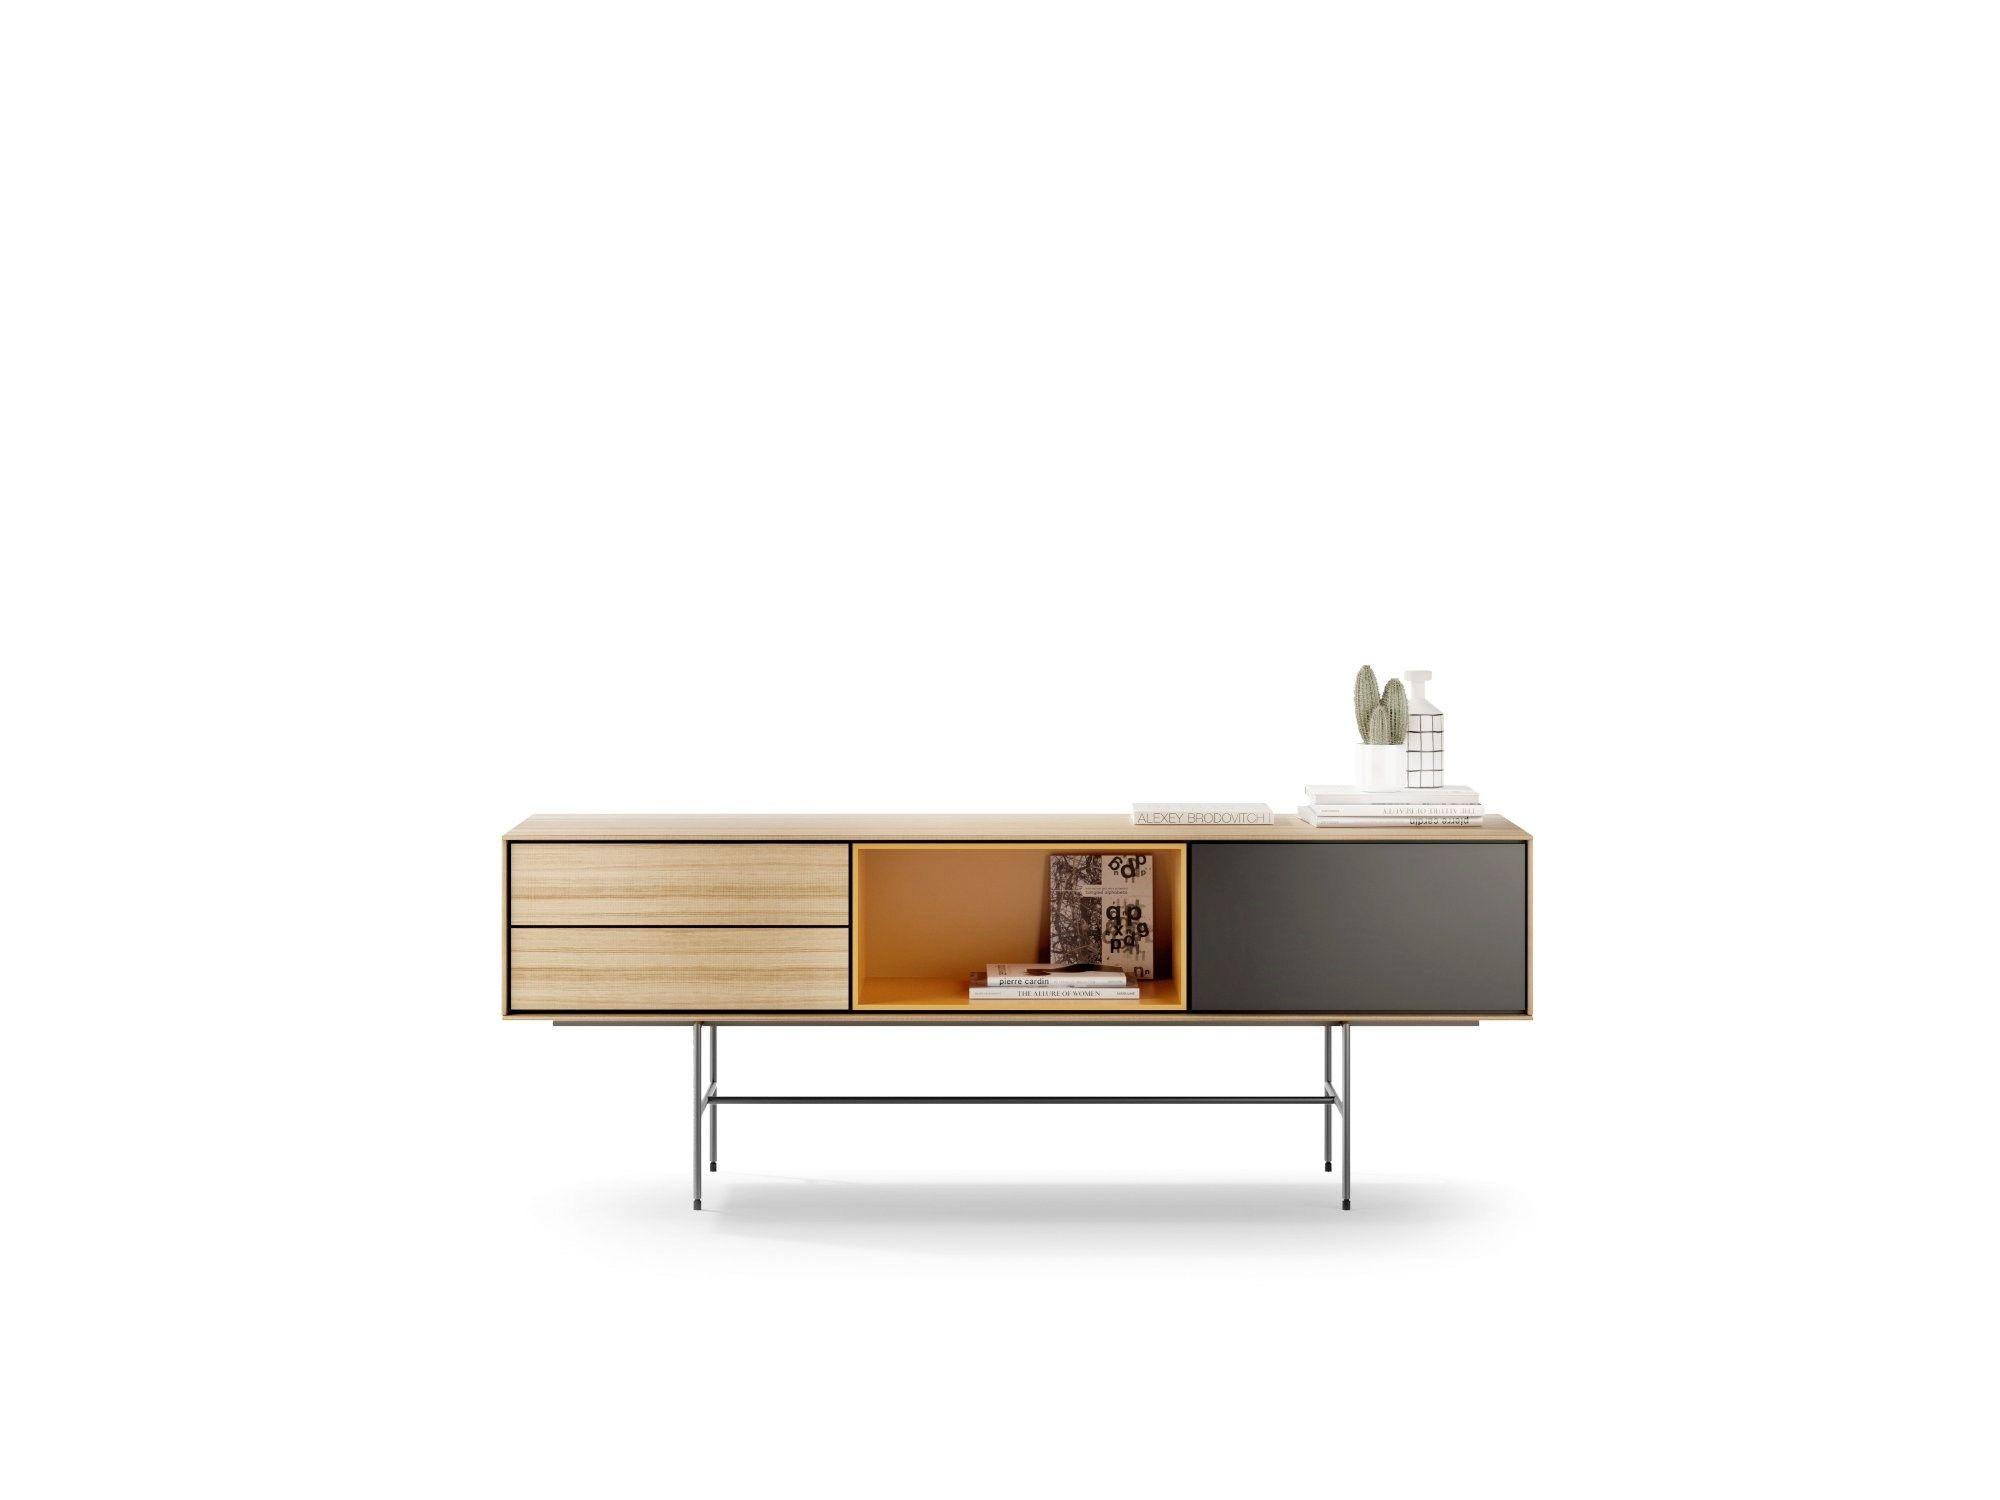 Aura Sideboard By Treku Design Angel Marti Enrique Delamo Furniture Sideboard Designs Wooden Sideboard